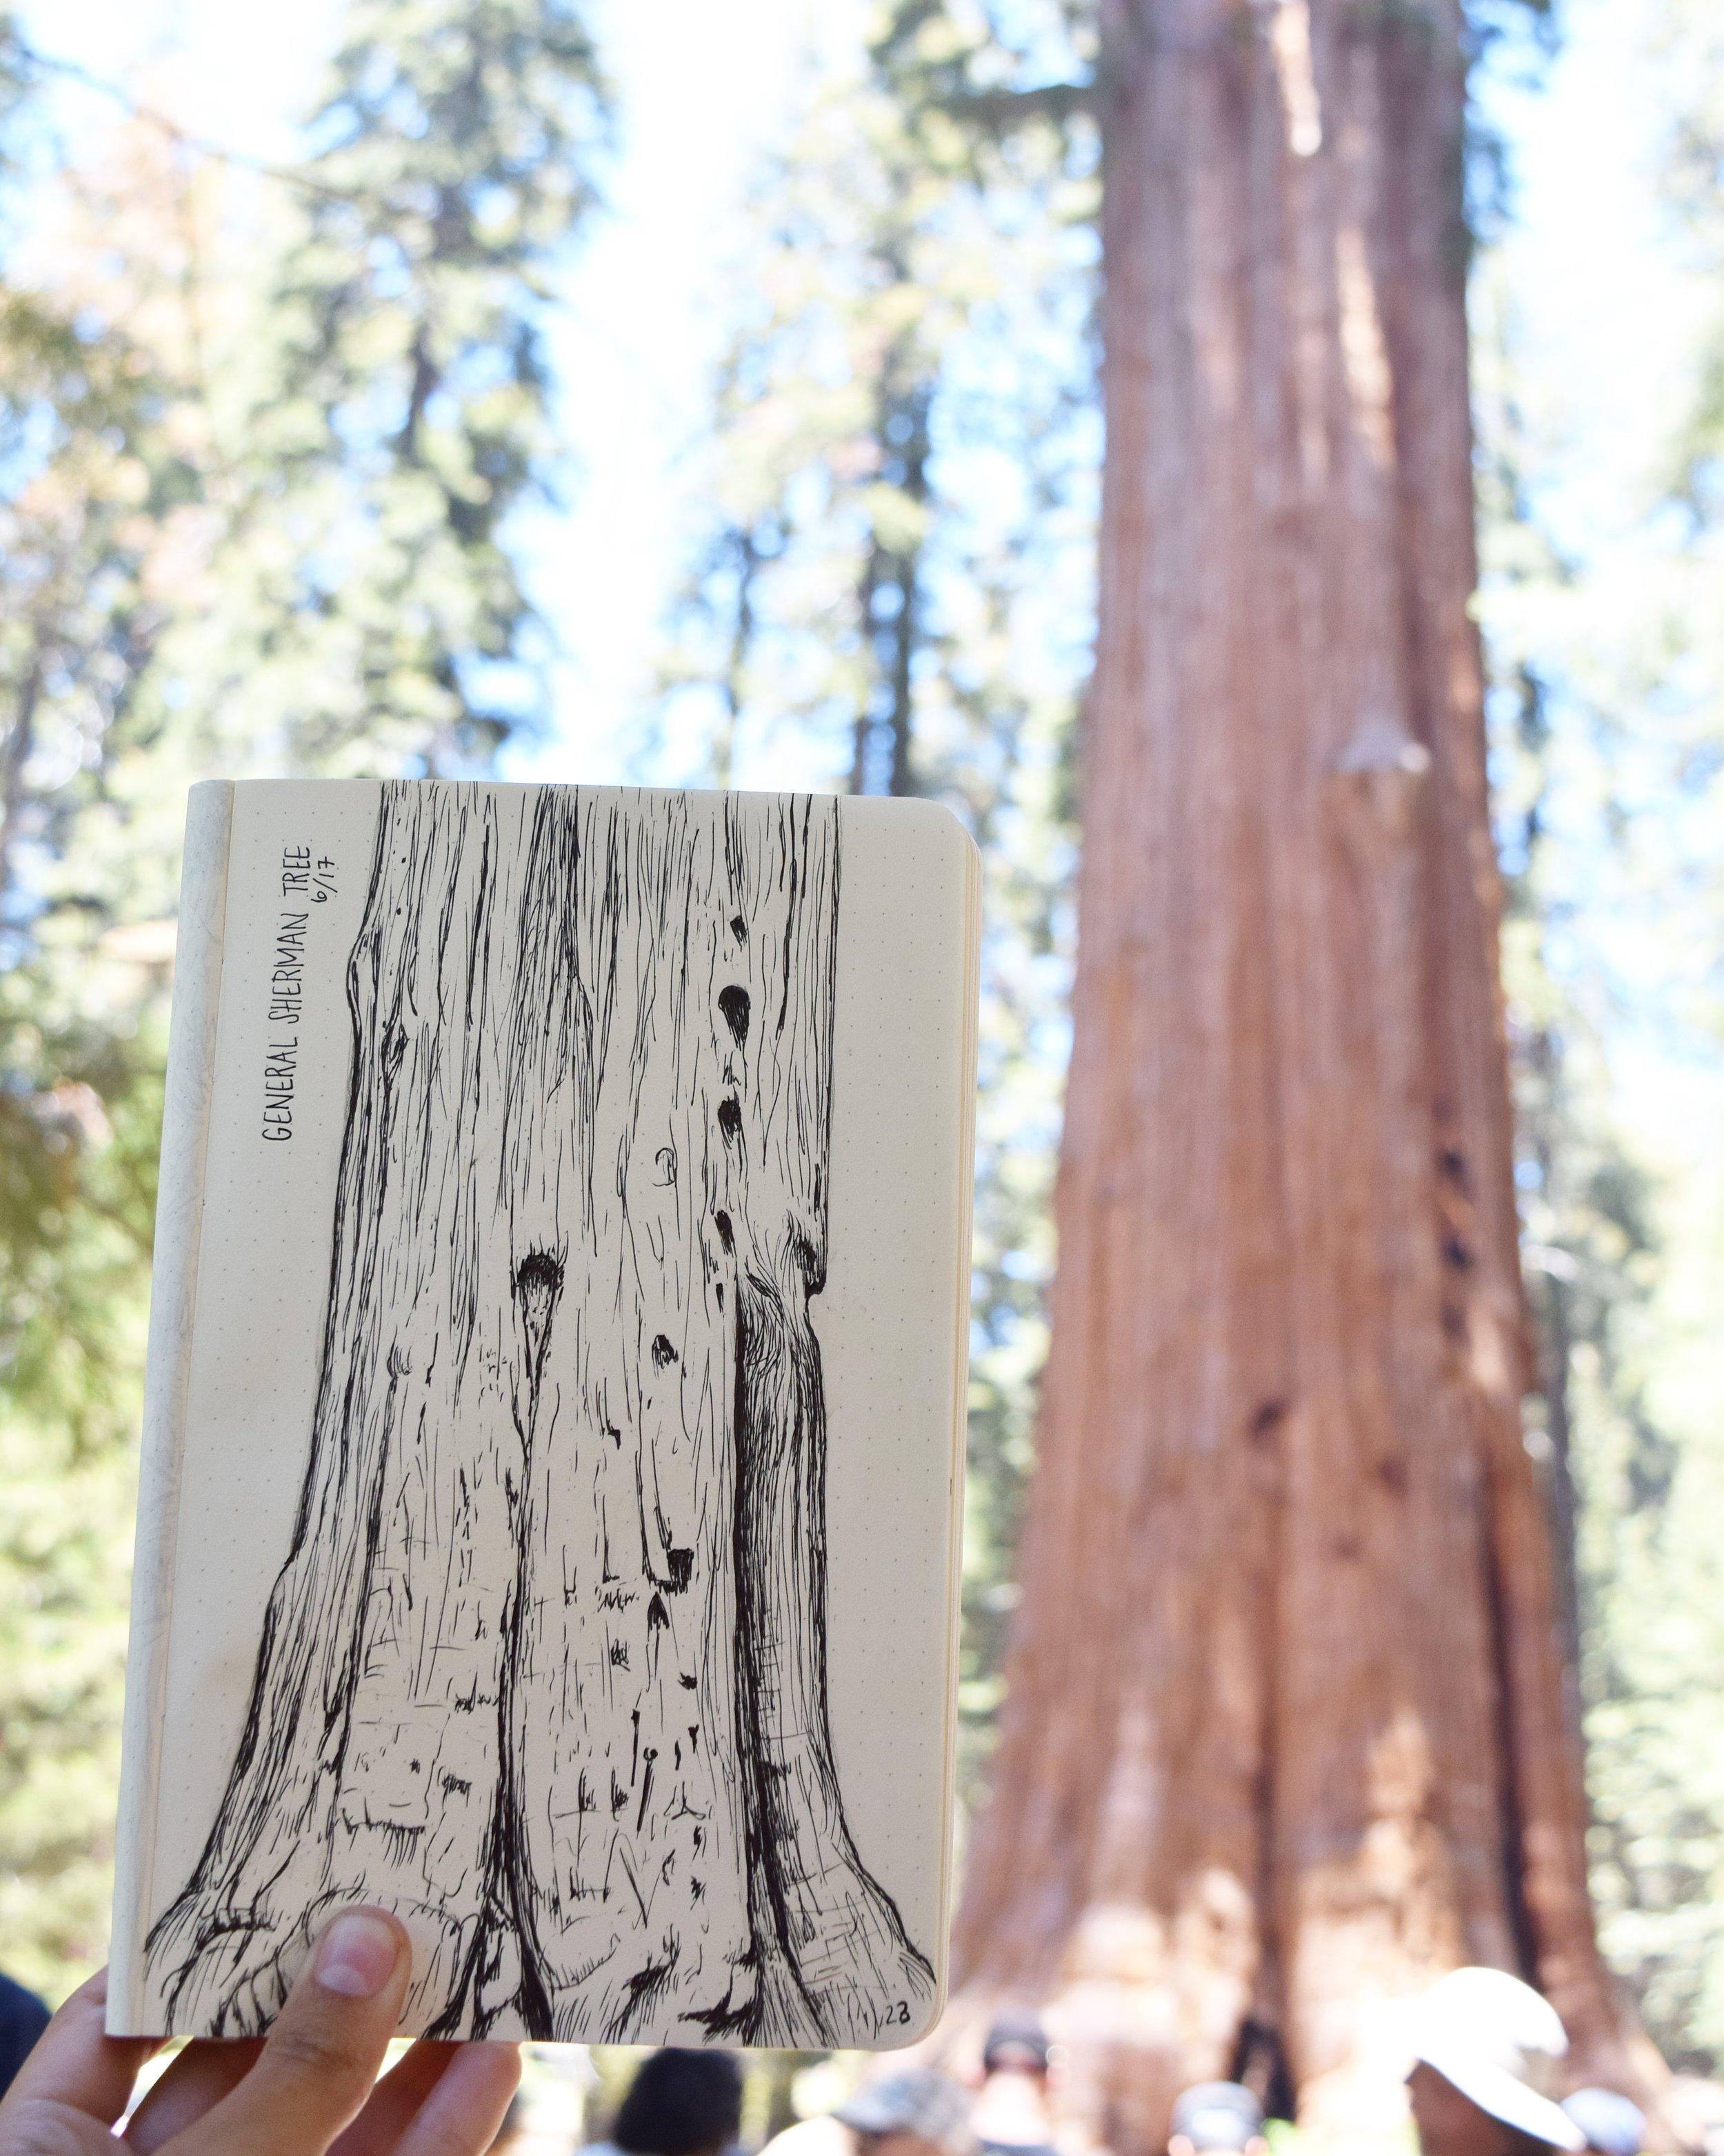 General Sherman Tree - Sequoia NP